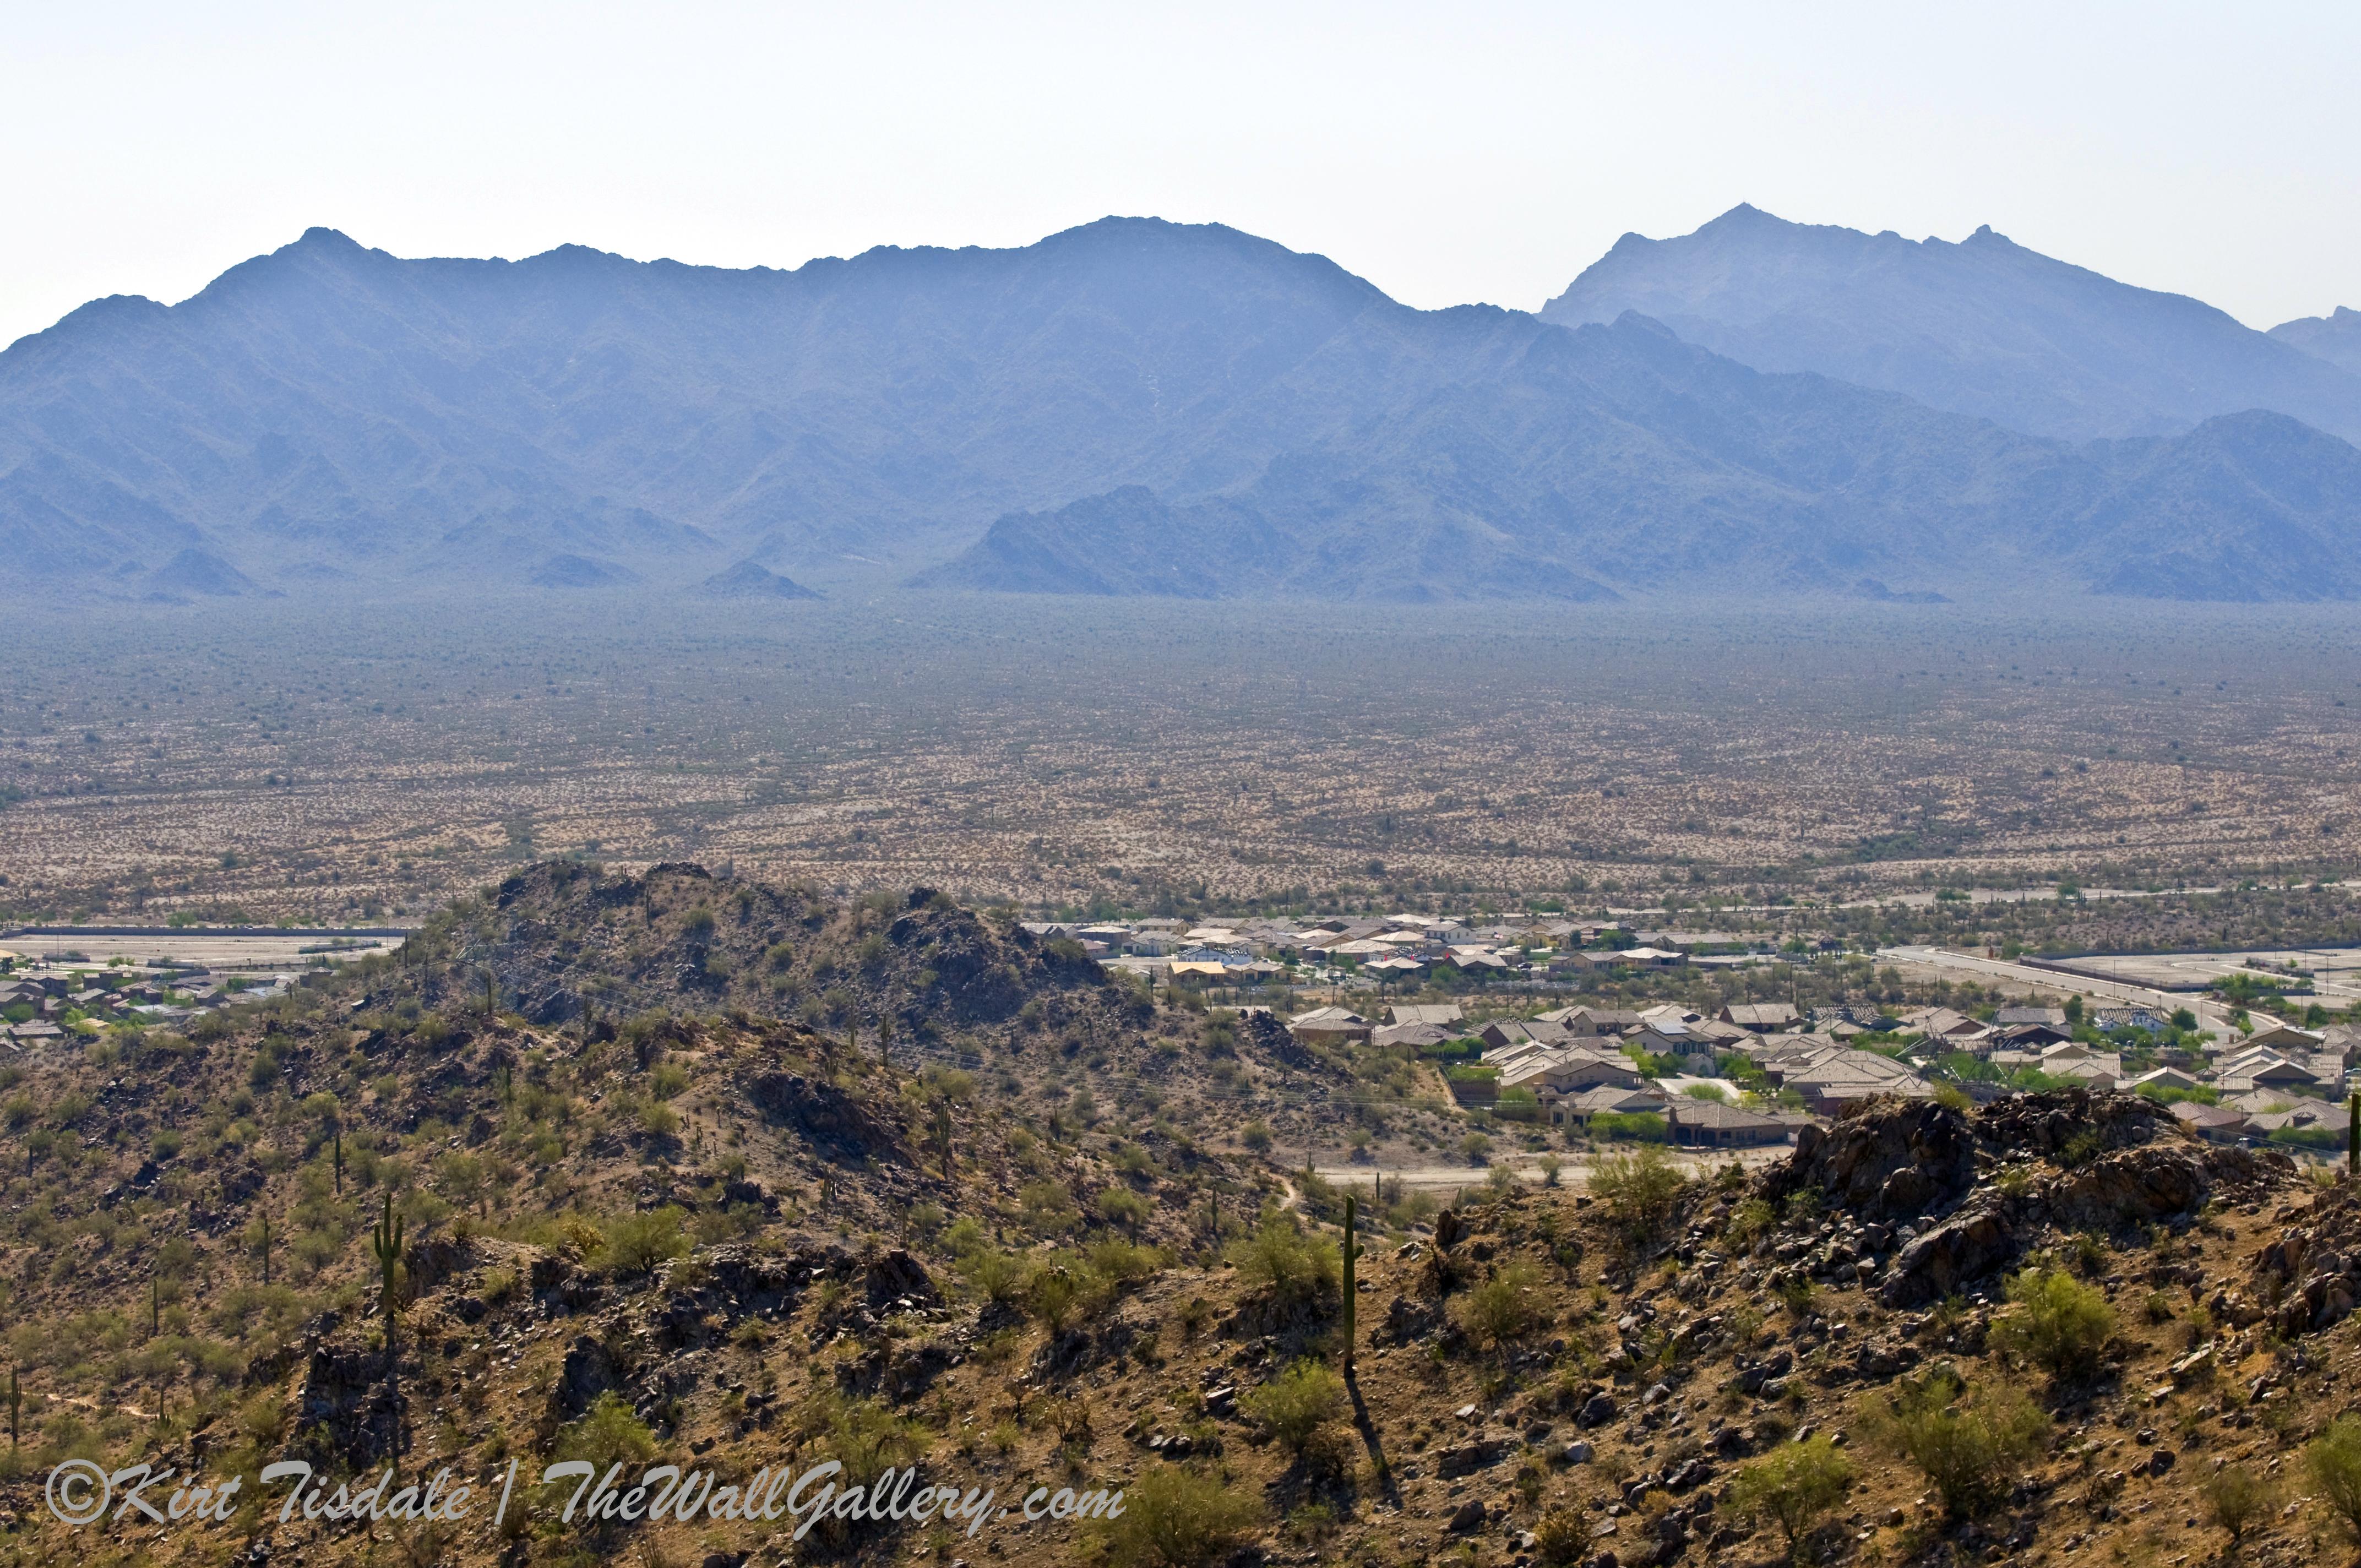 Desert Hike: The Top